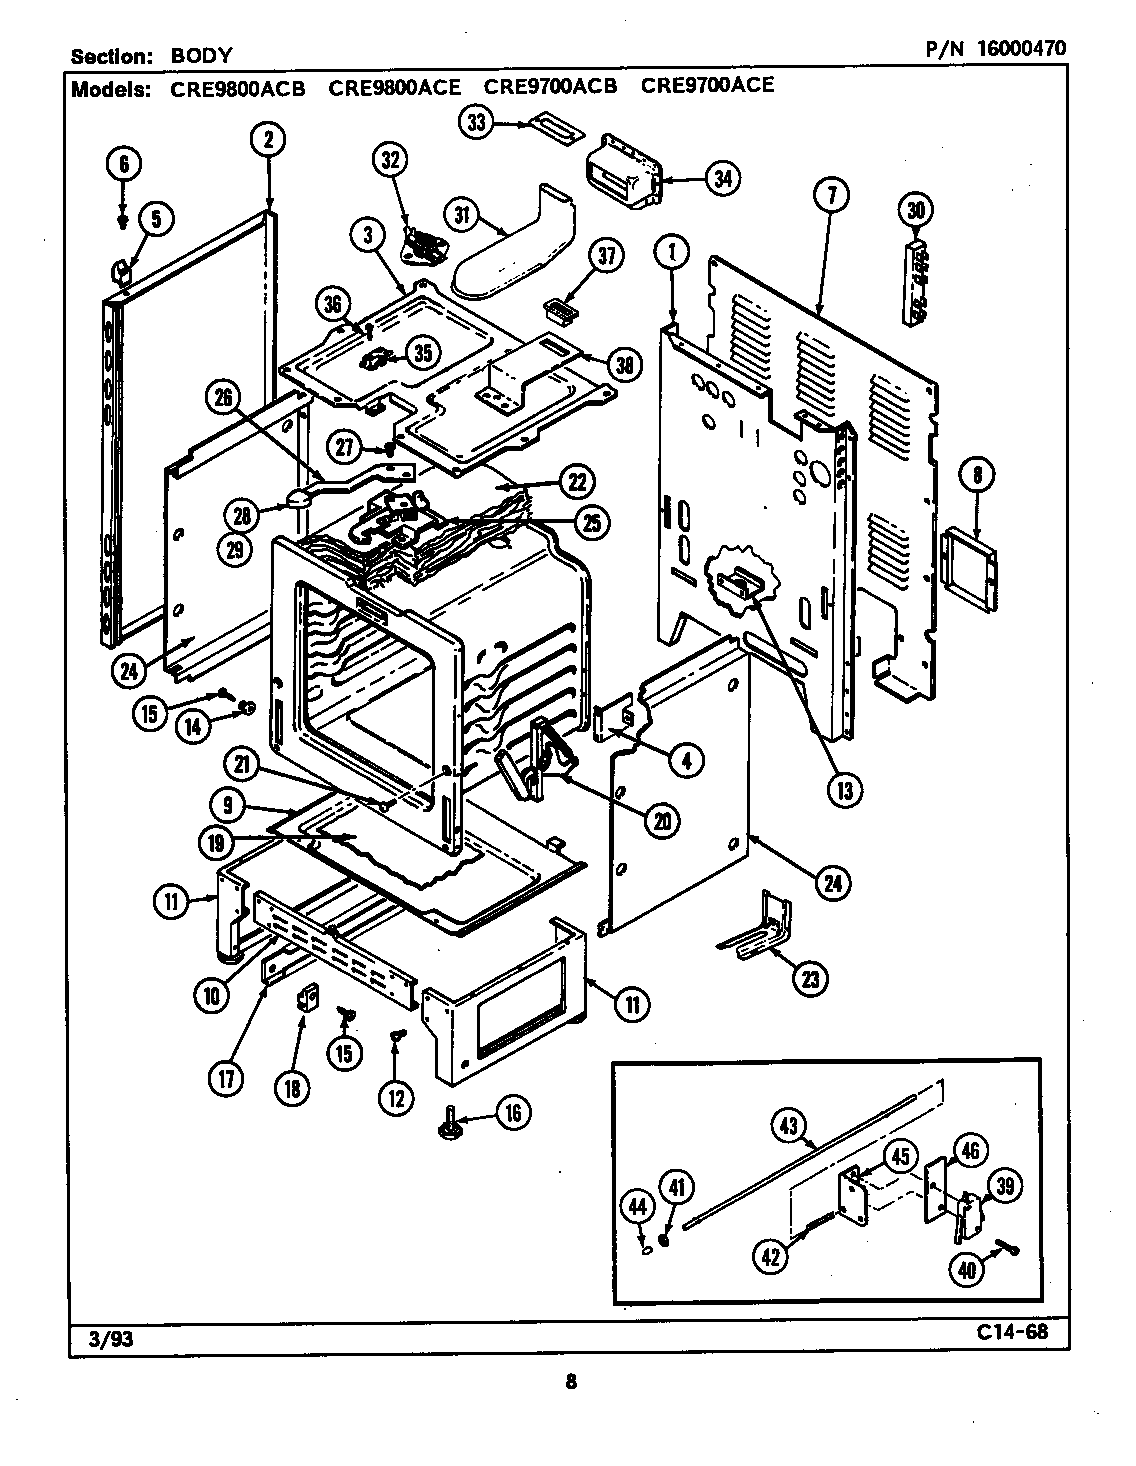 hight resolution of traulsen wiring diagrams electrical covuk rep mannheim de u2022traulsen wiring diagrams best wiring library rh